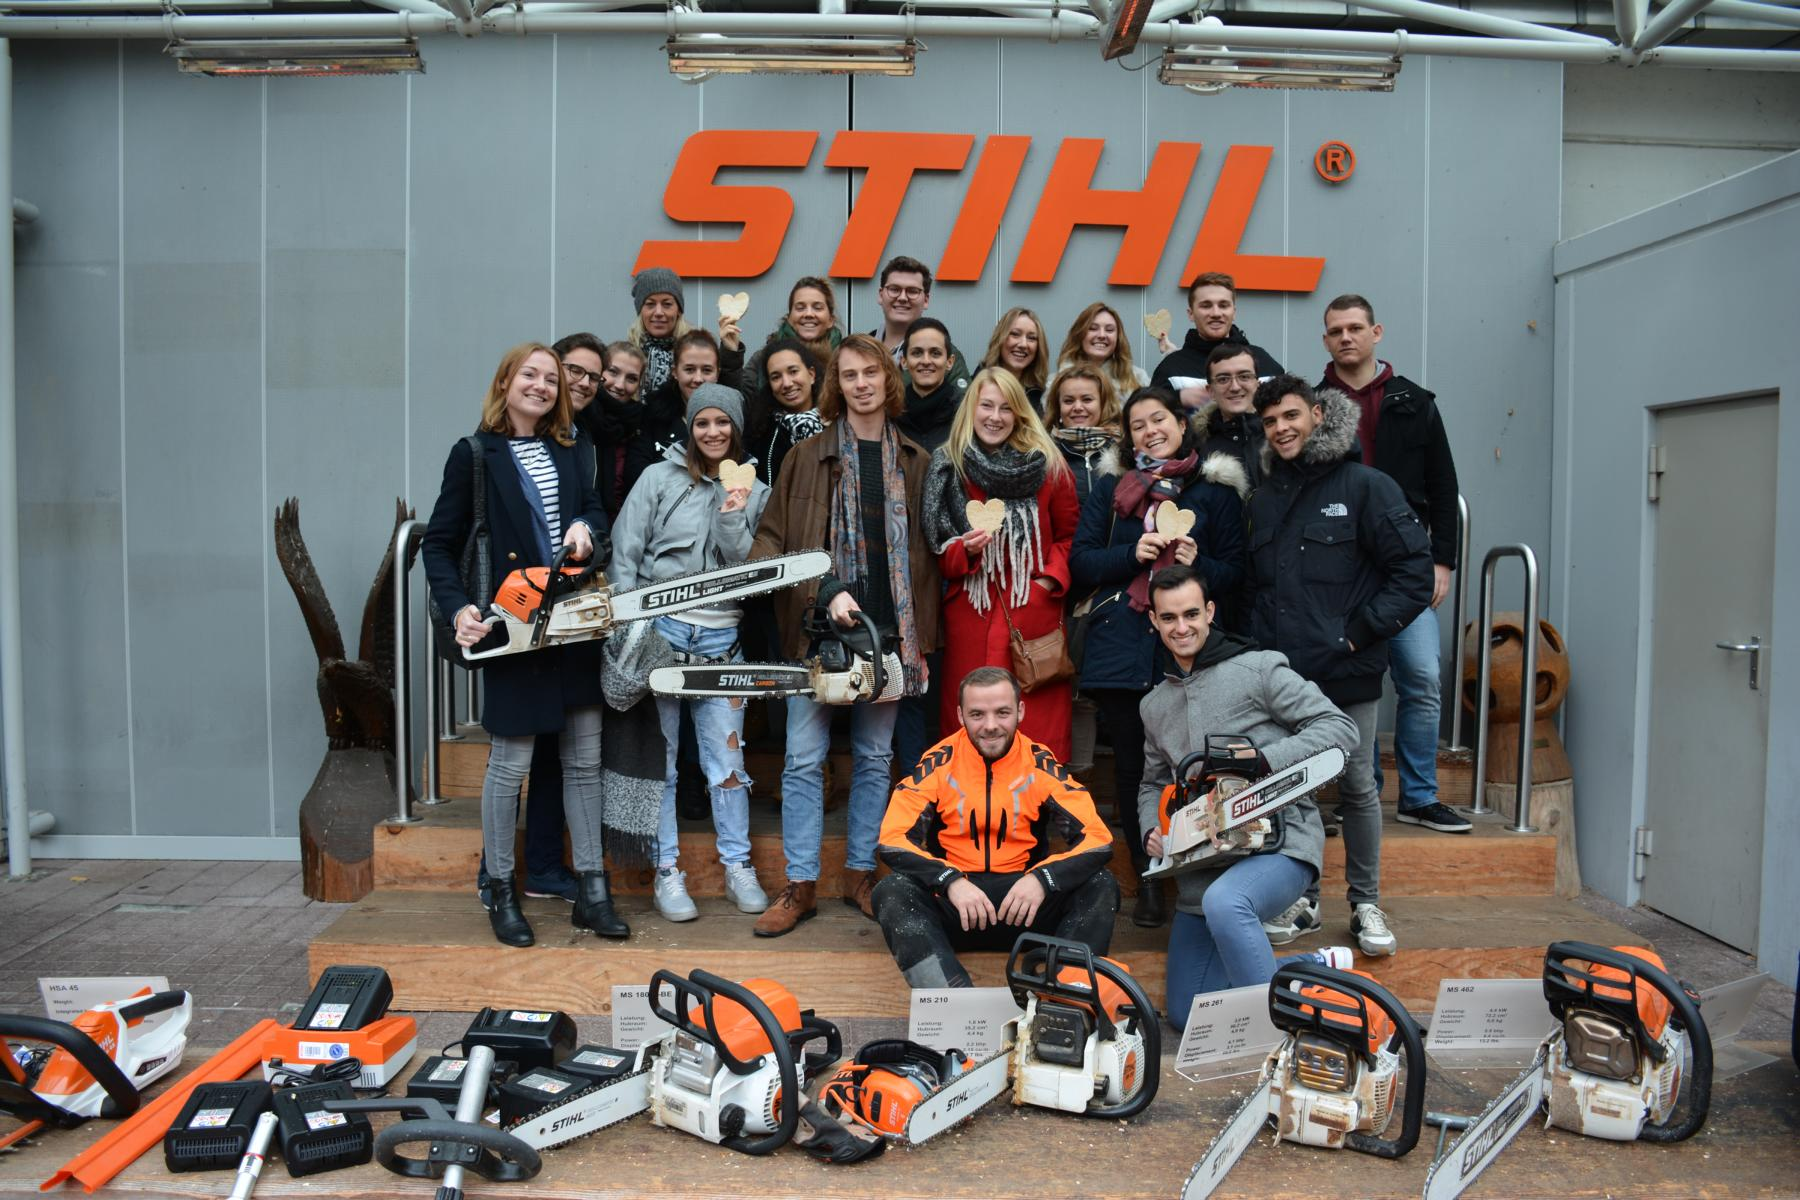 Visita a la empresa Andreas Stihl